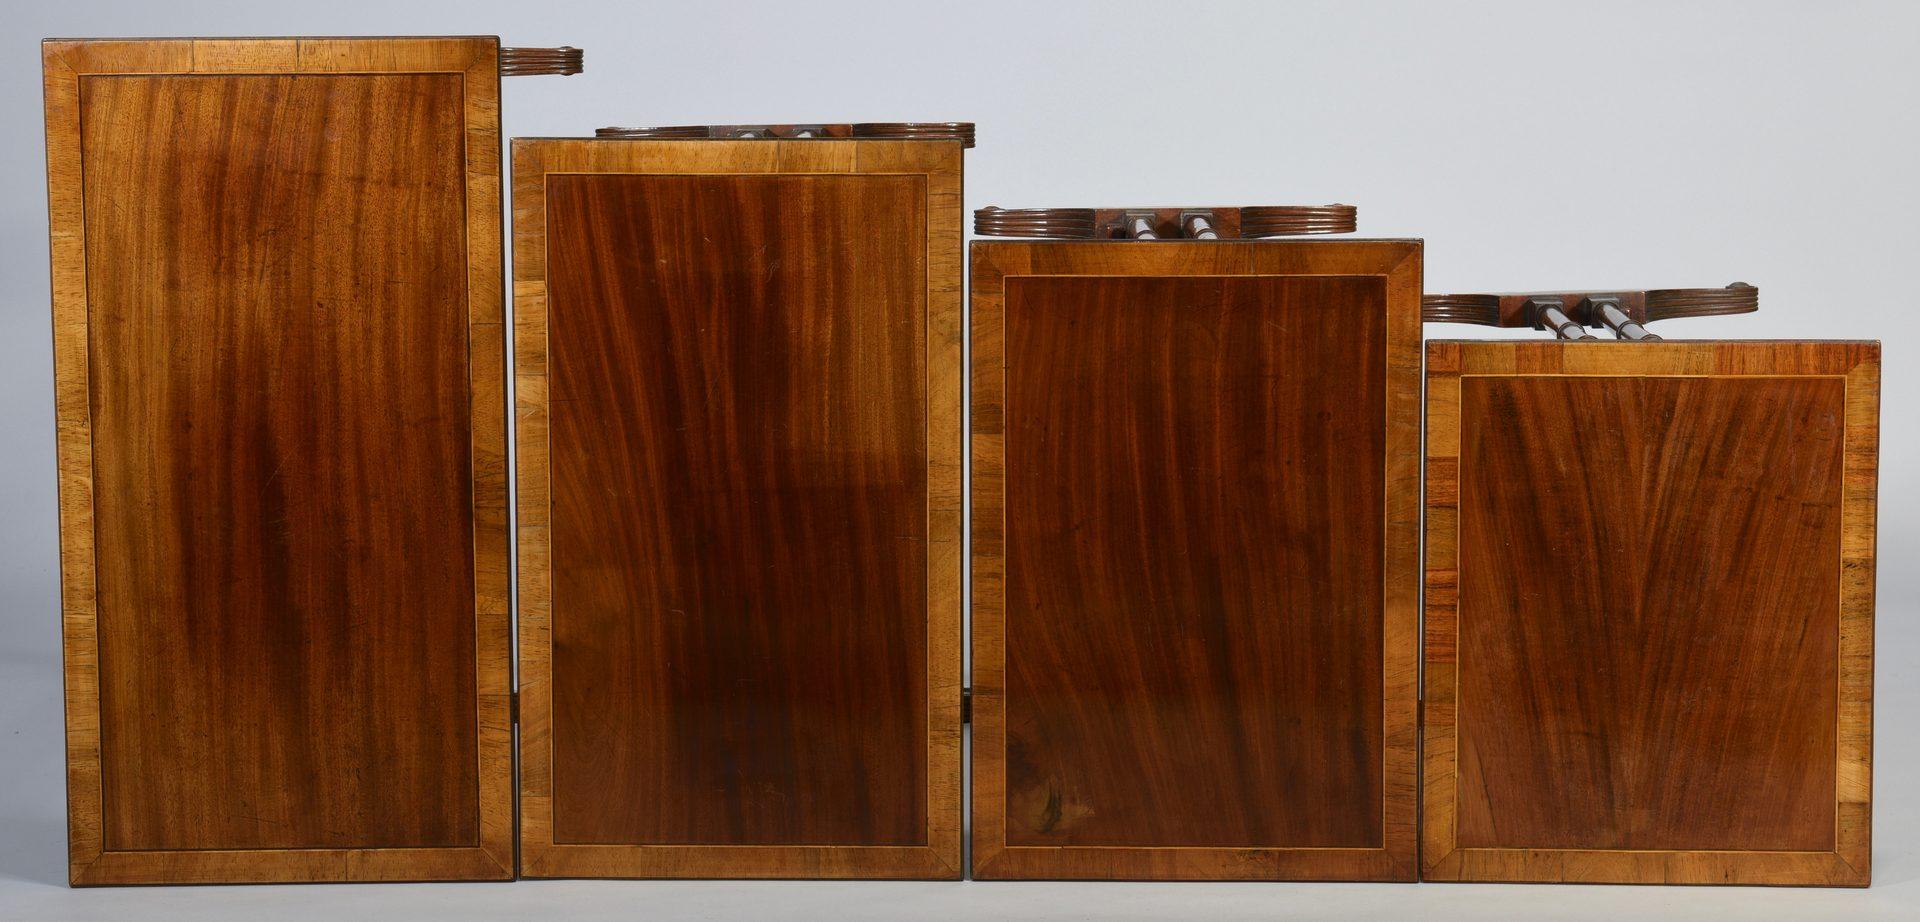 Lot 98: Set 4 Period Nesting or Quartetto Tables